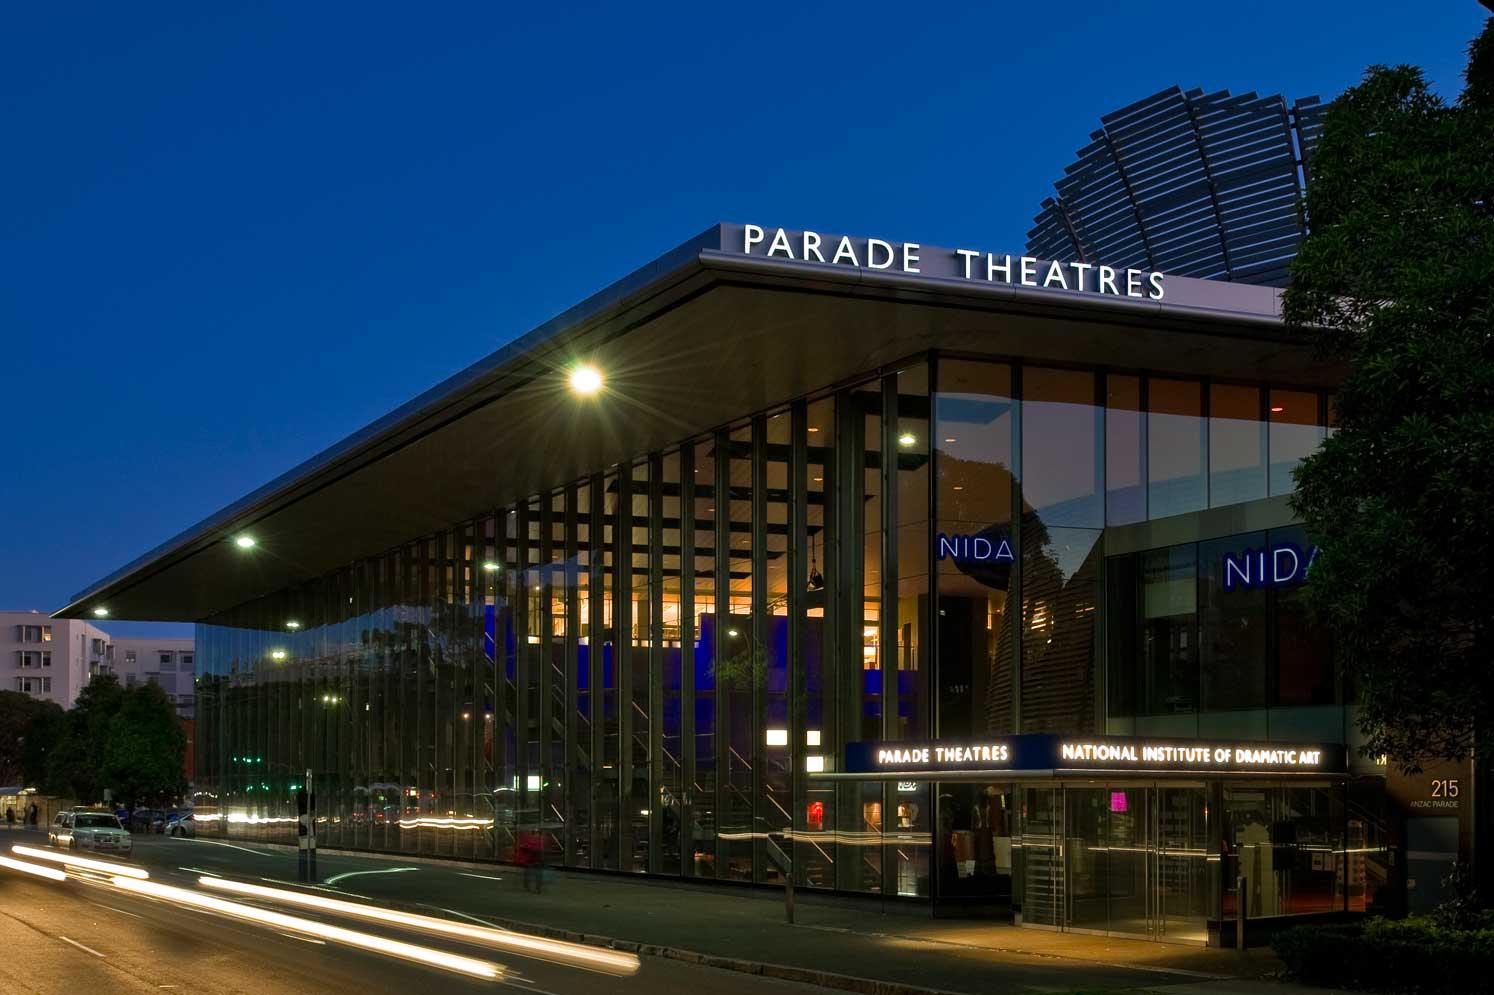 NIDA parade theatres.jpg